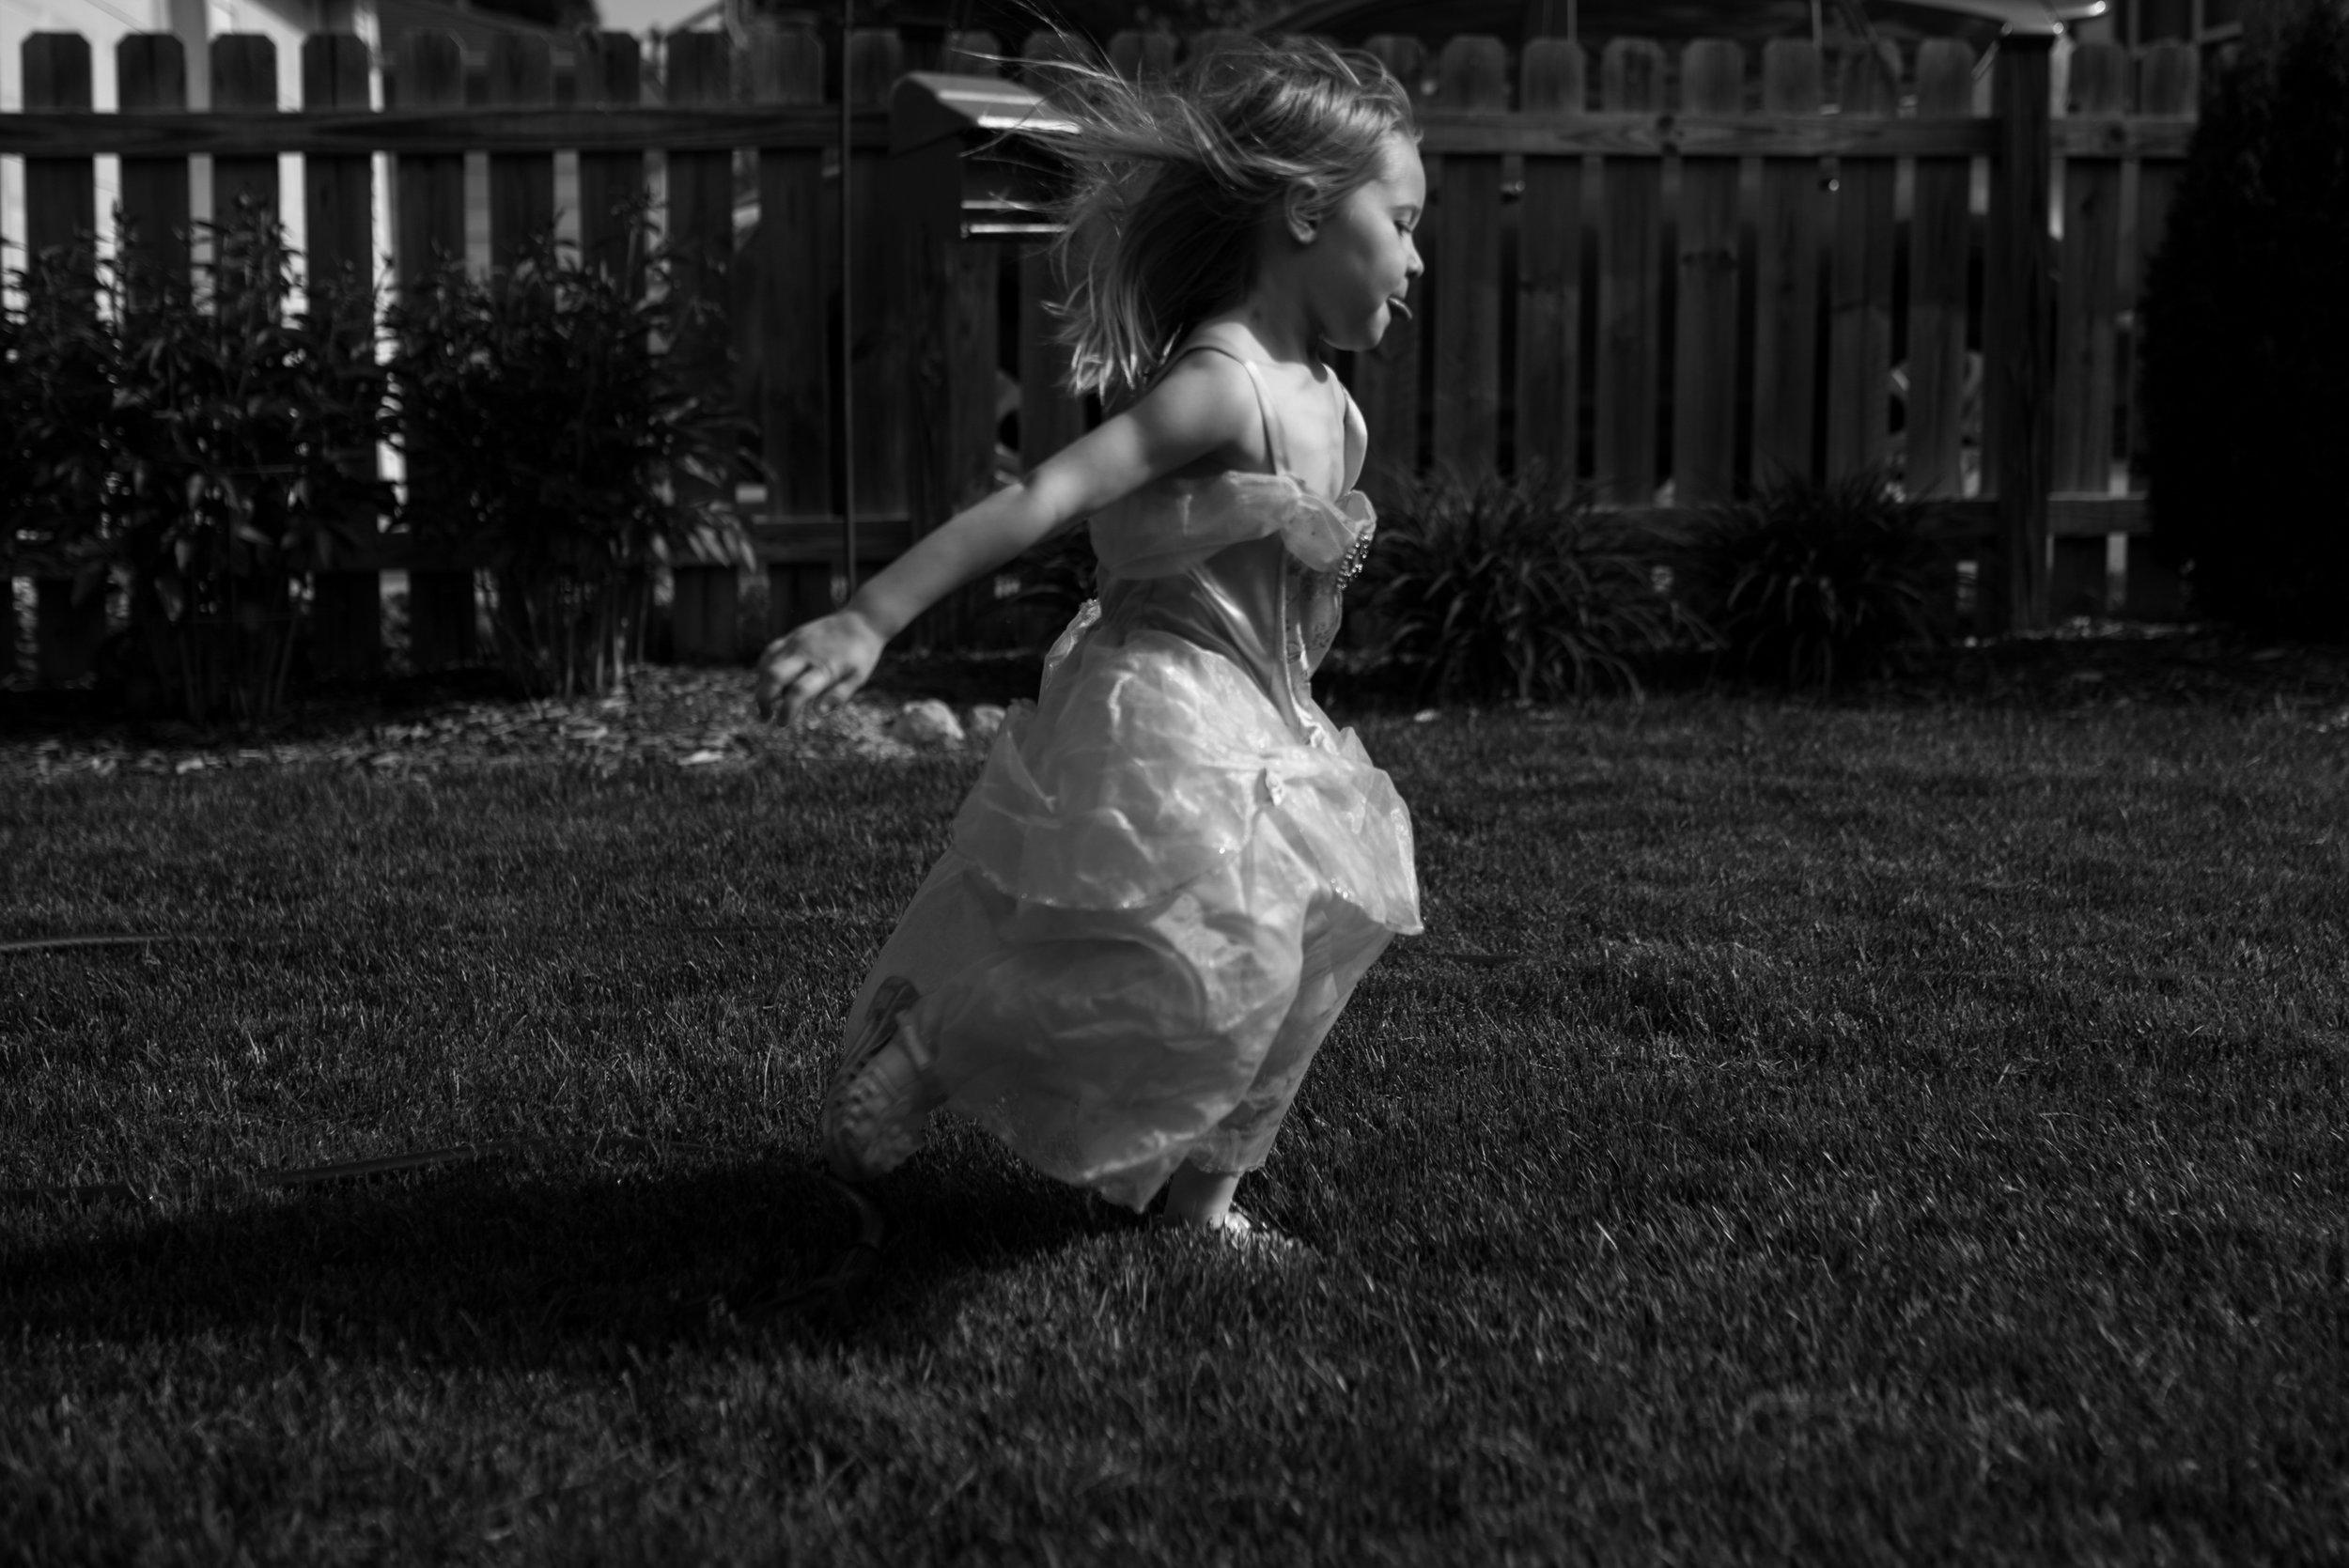 Kari Gierach Photography, Milwaukee Wisconsin documentary family photographer, Wauwatosa candid family photo, summer, girl running in  backyard-1.jpg